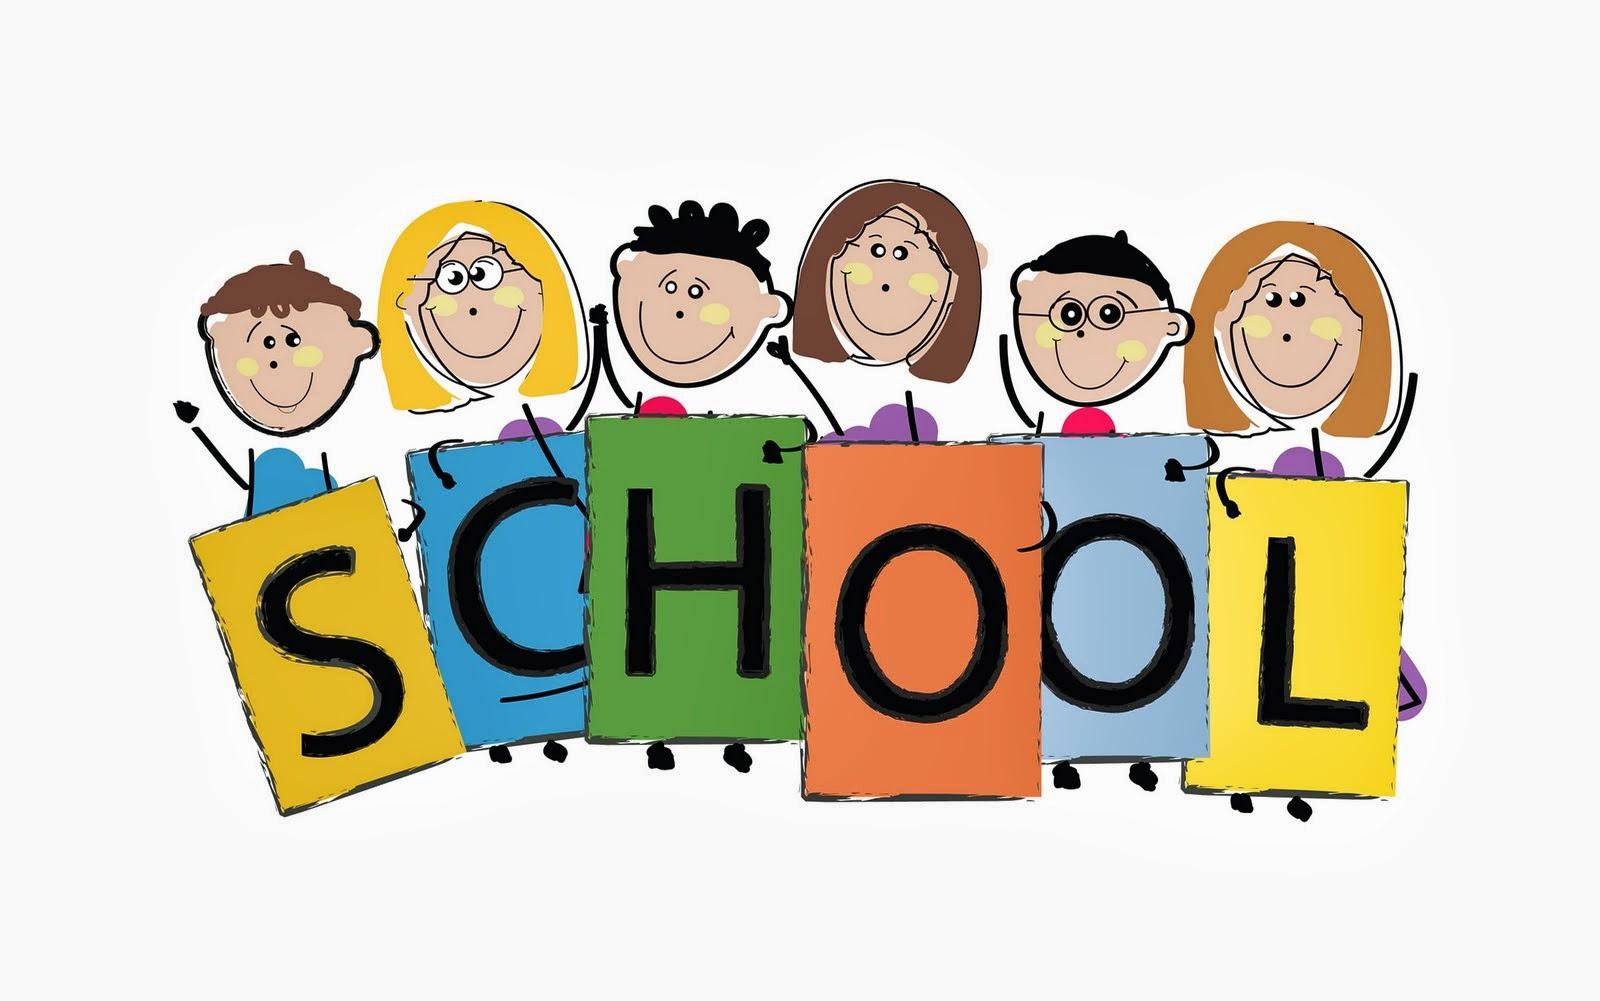 clipart school starts - photo #29